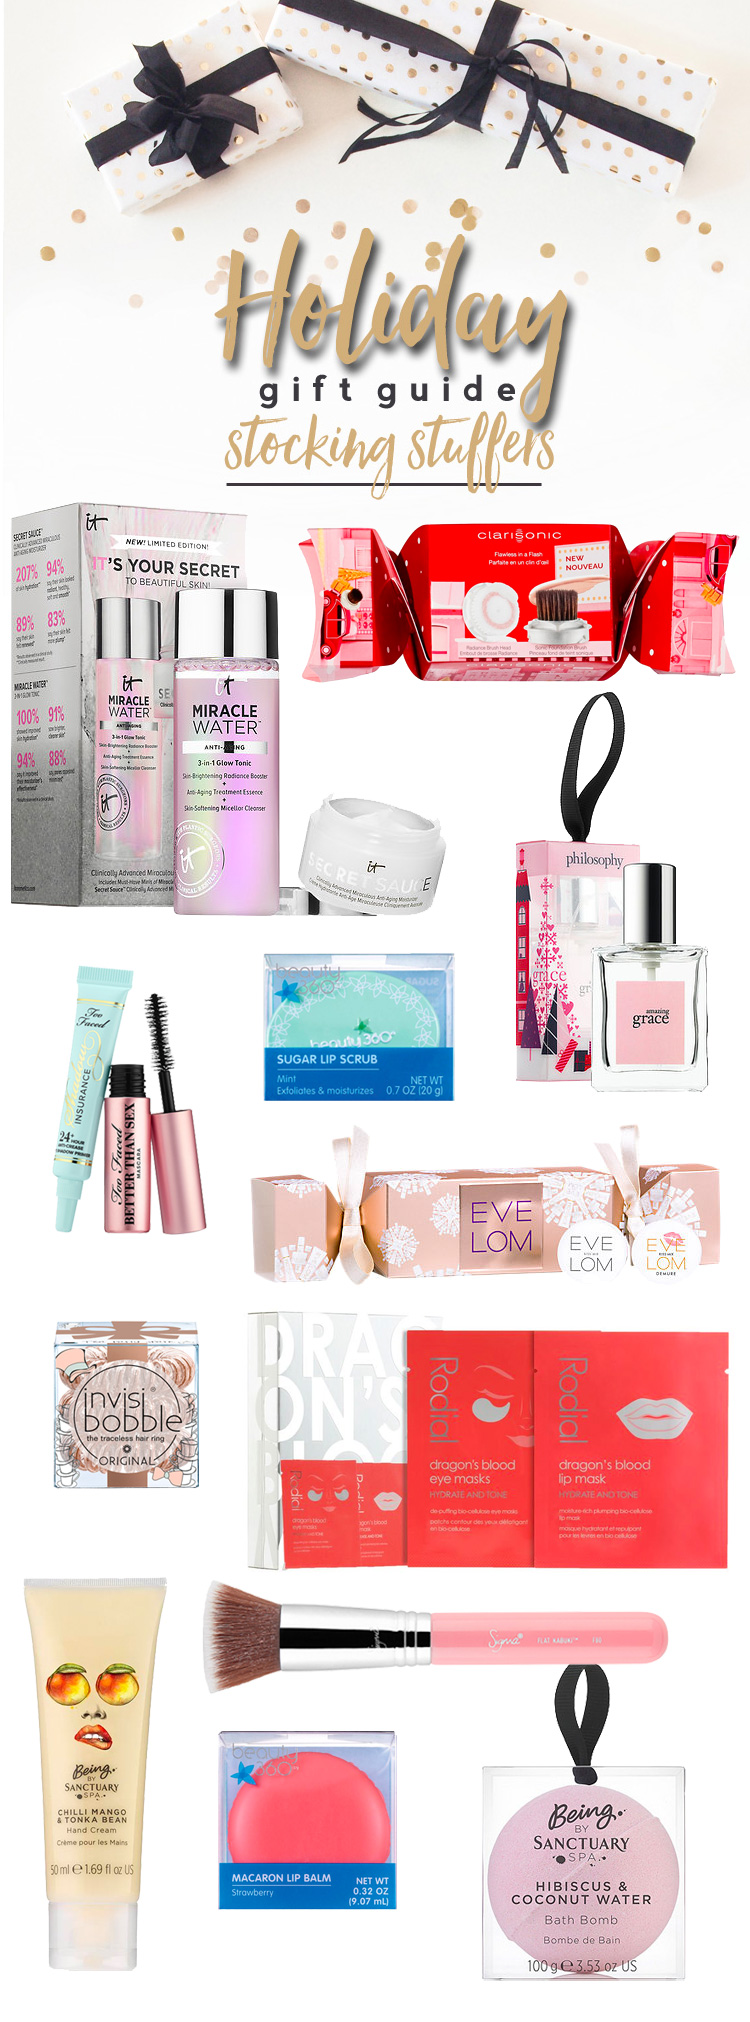 Holiday Gift Guide 2017: Beauty Stocking Stuffers